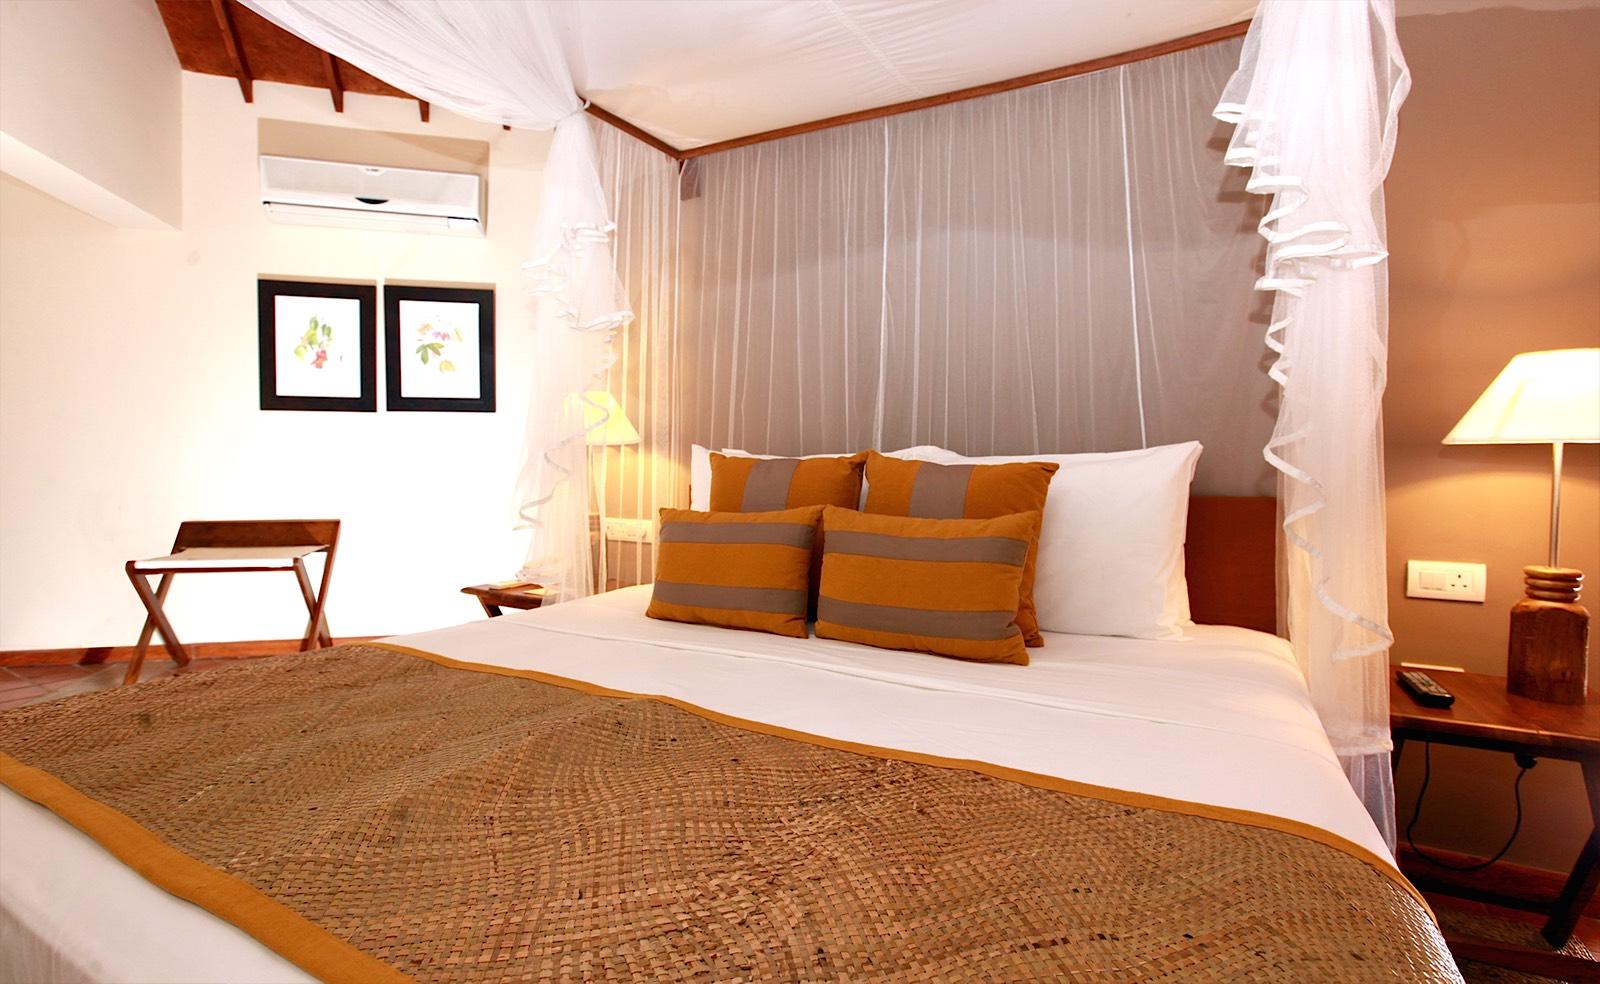 invite-to-paradise-holiday-honeymoon-sri-lanka-specialists-safari-lodge-cinnamon-wild-jungle-chalet-1.jpg